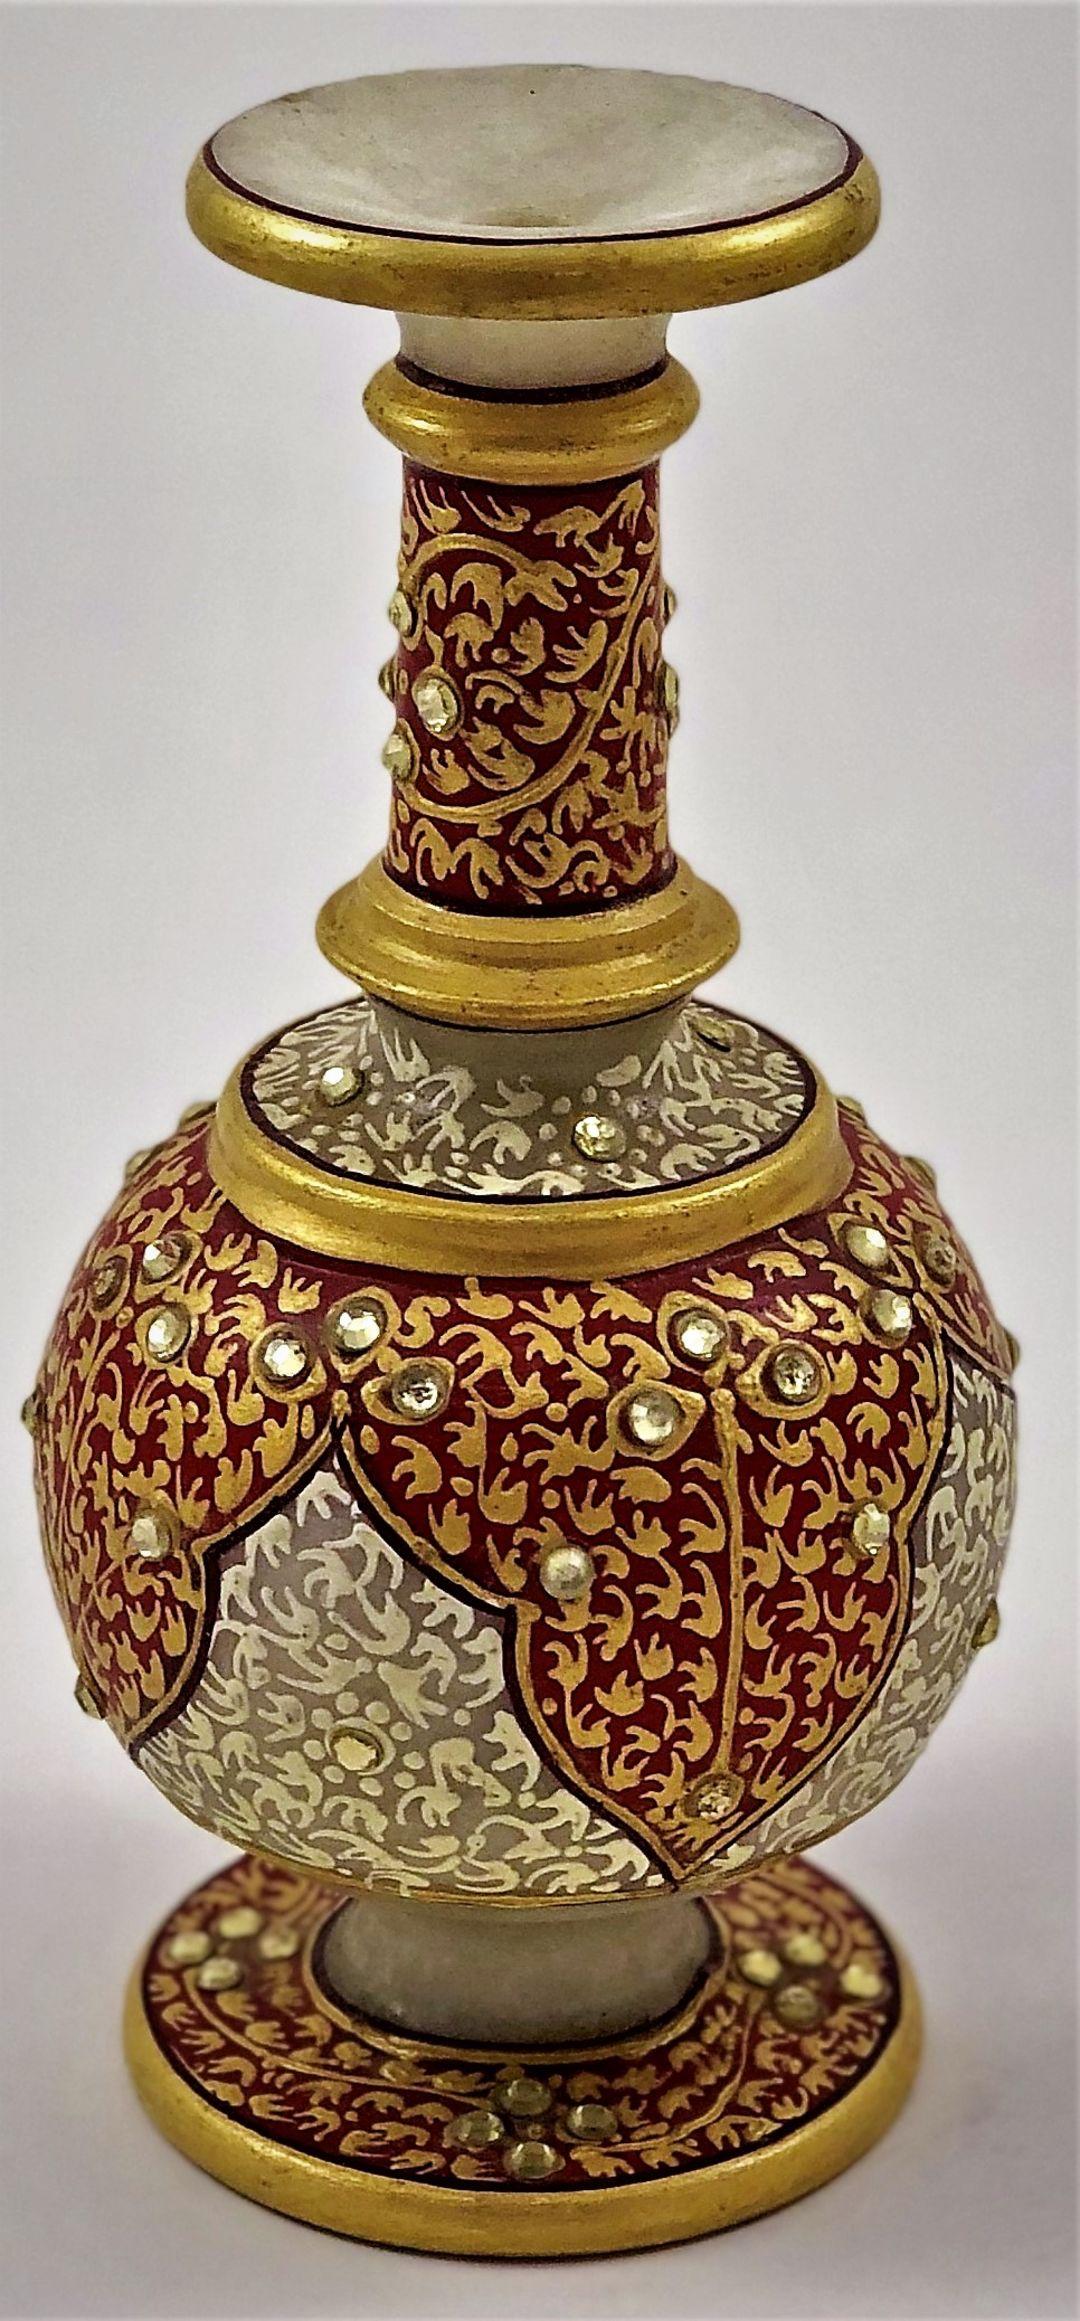 Jeweled rich white marble vase